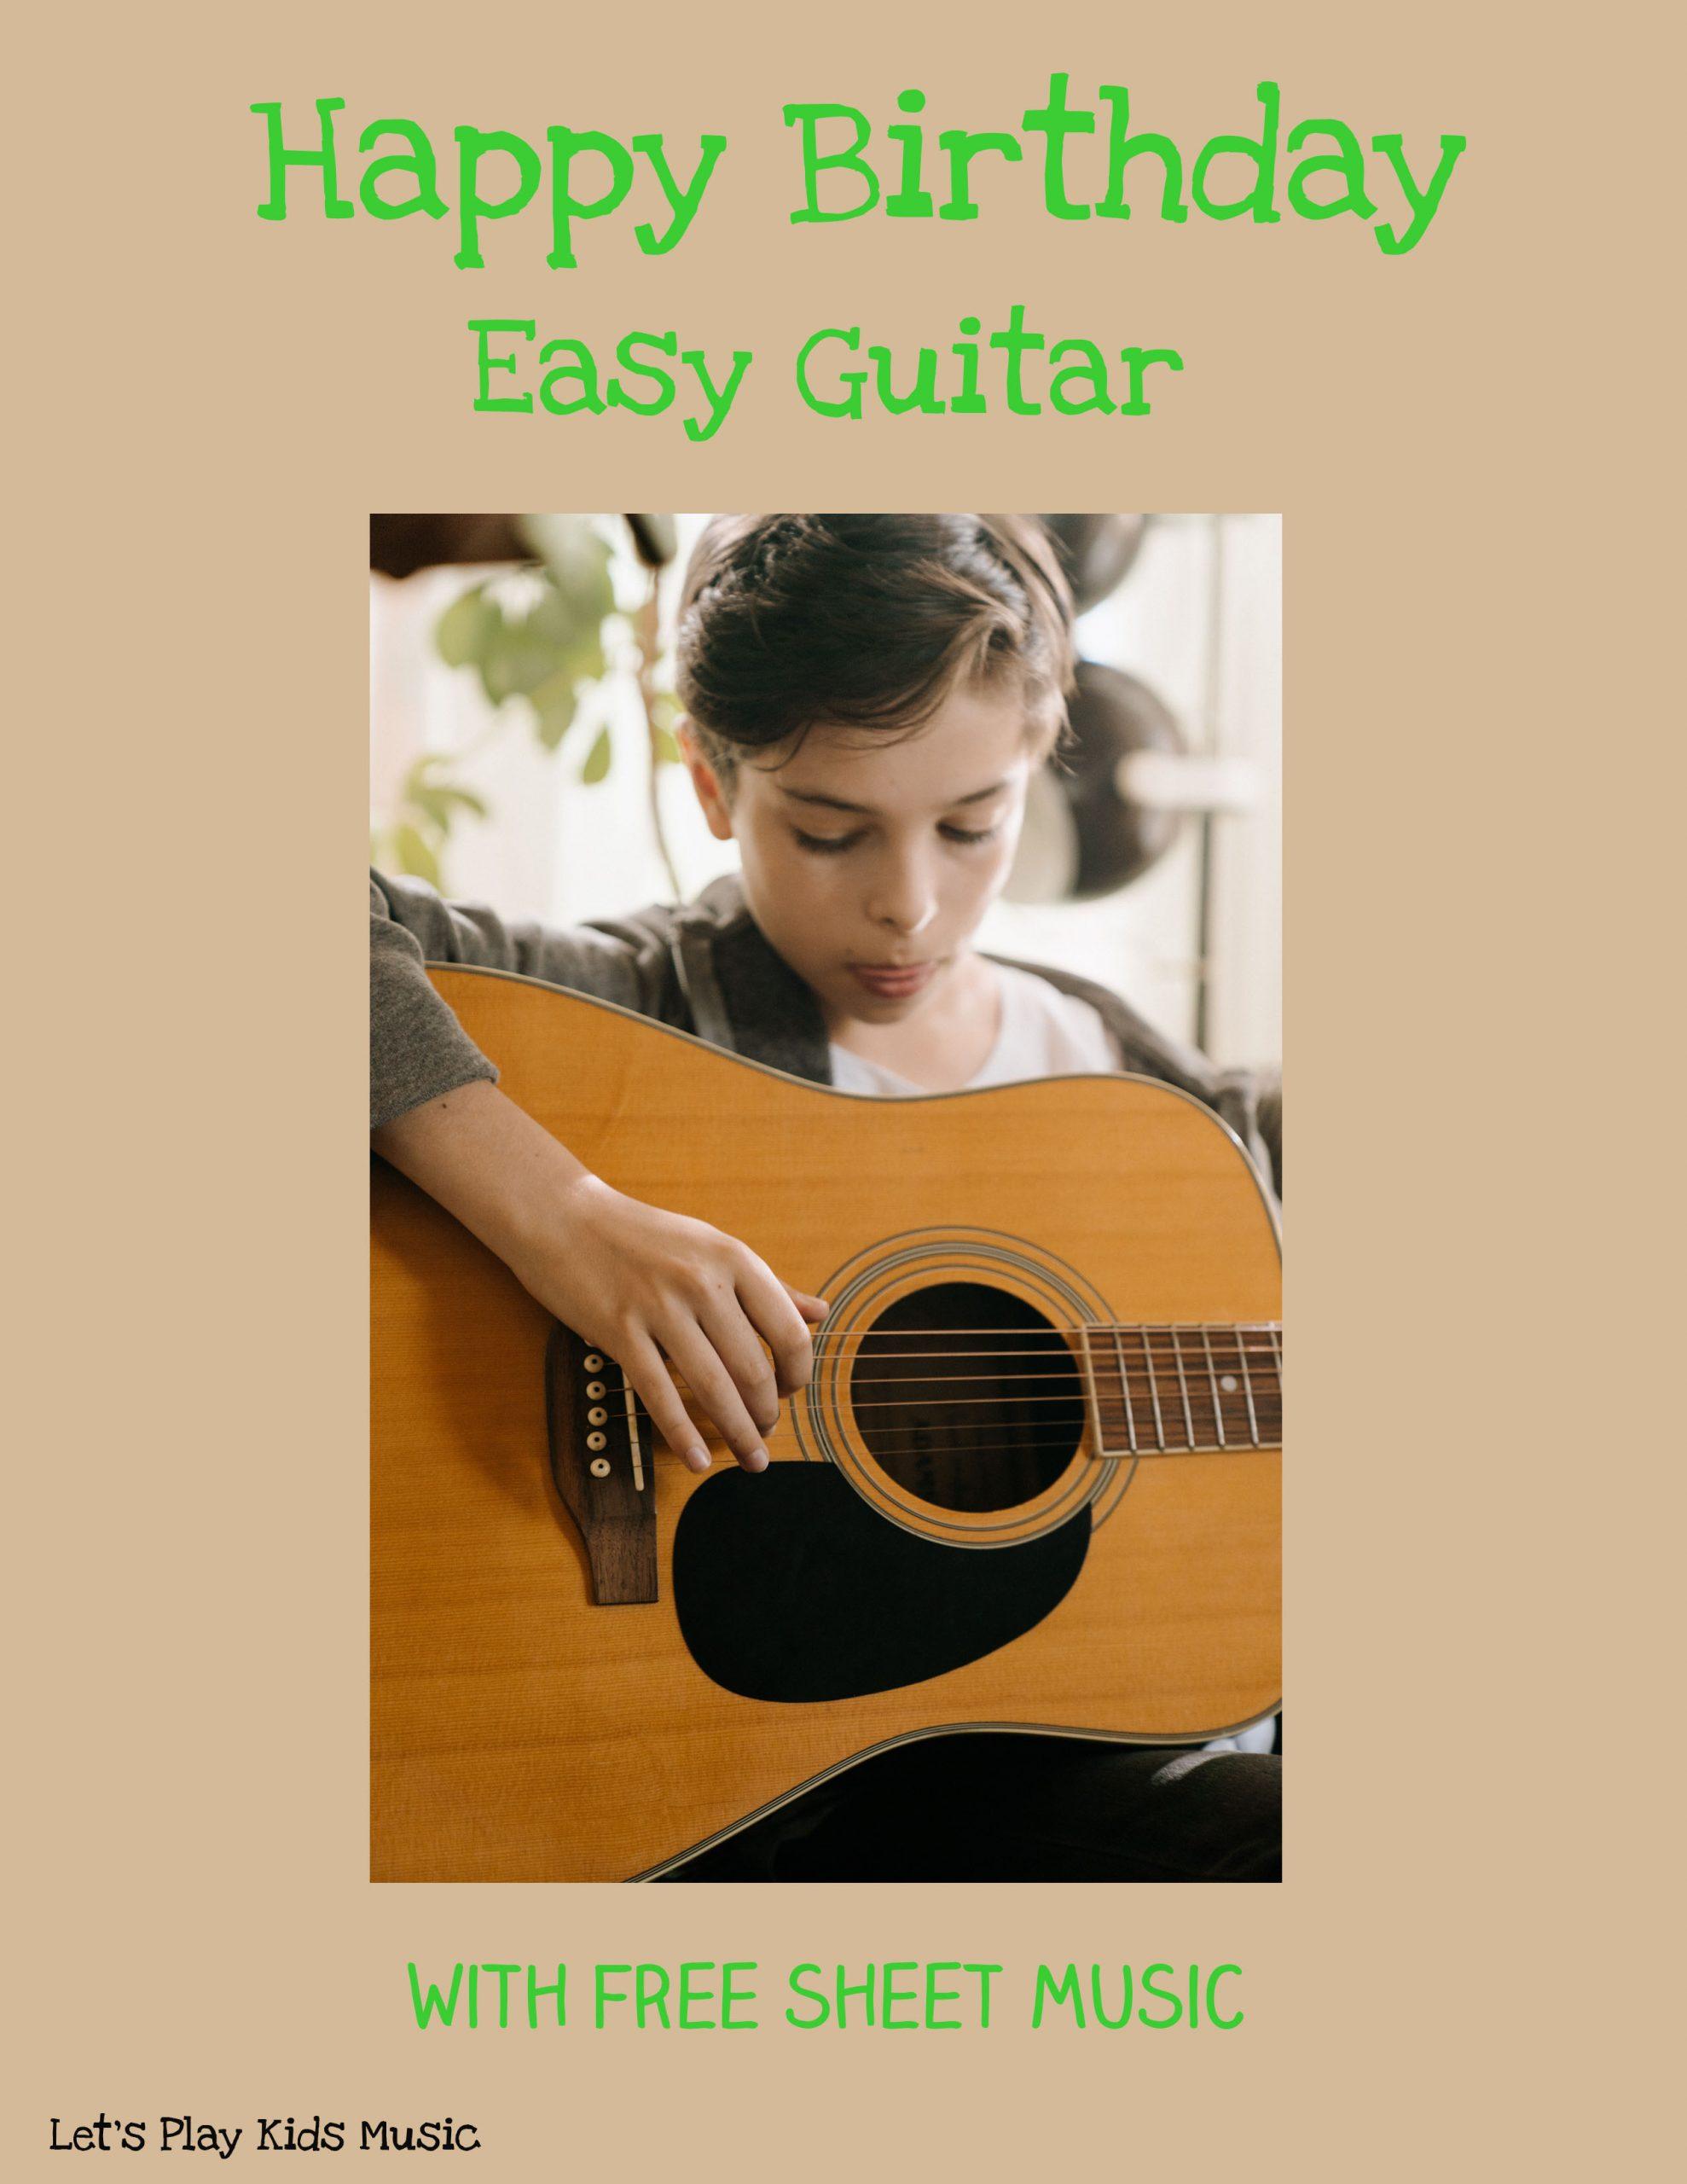 HHappy Birthday Easy Guitar